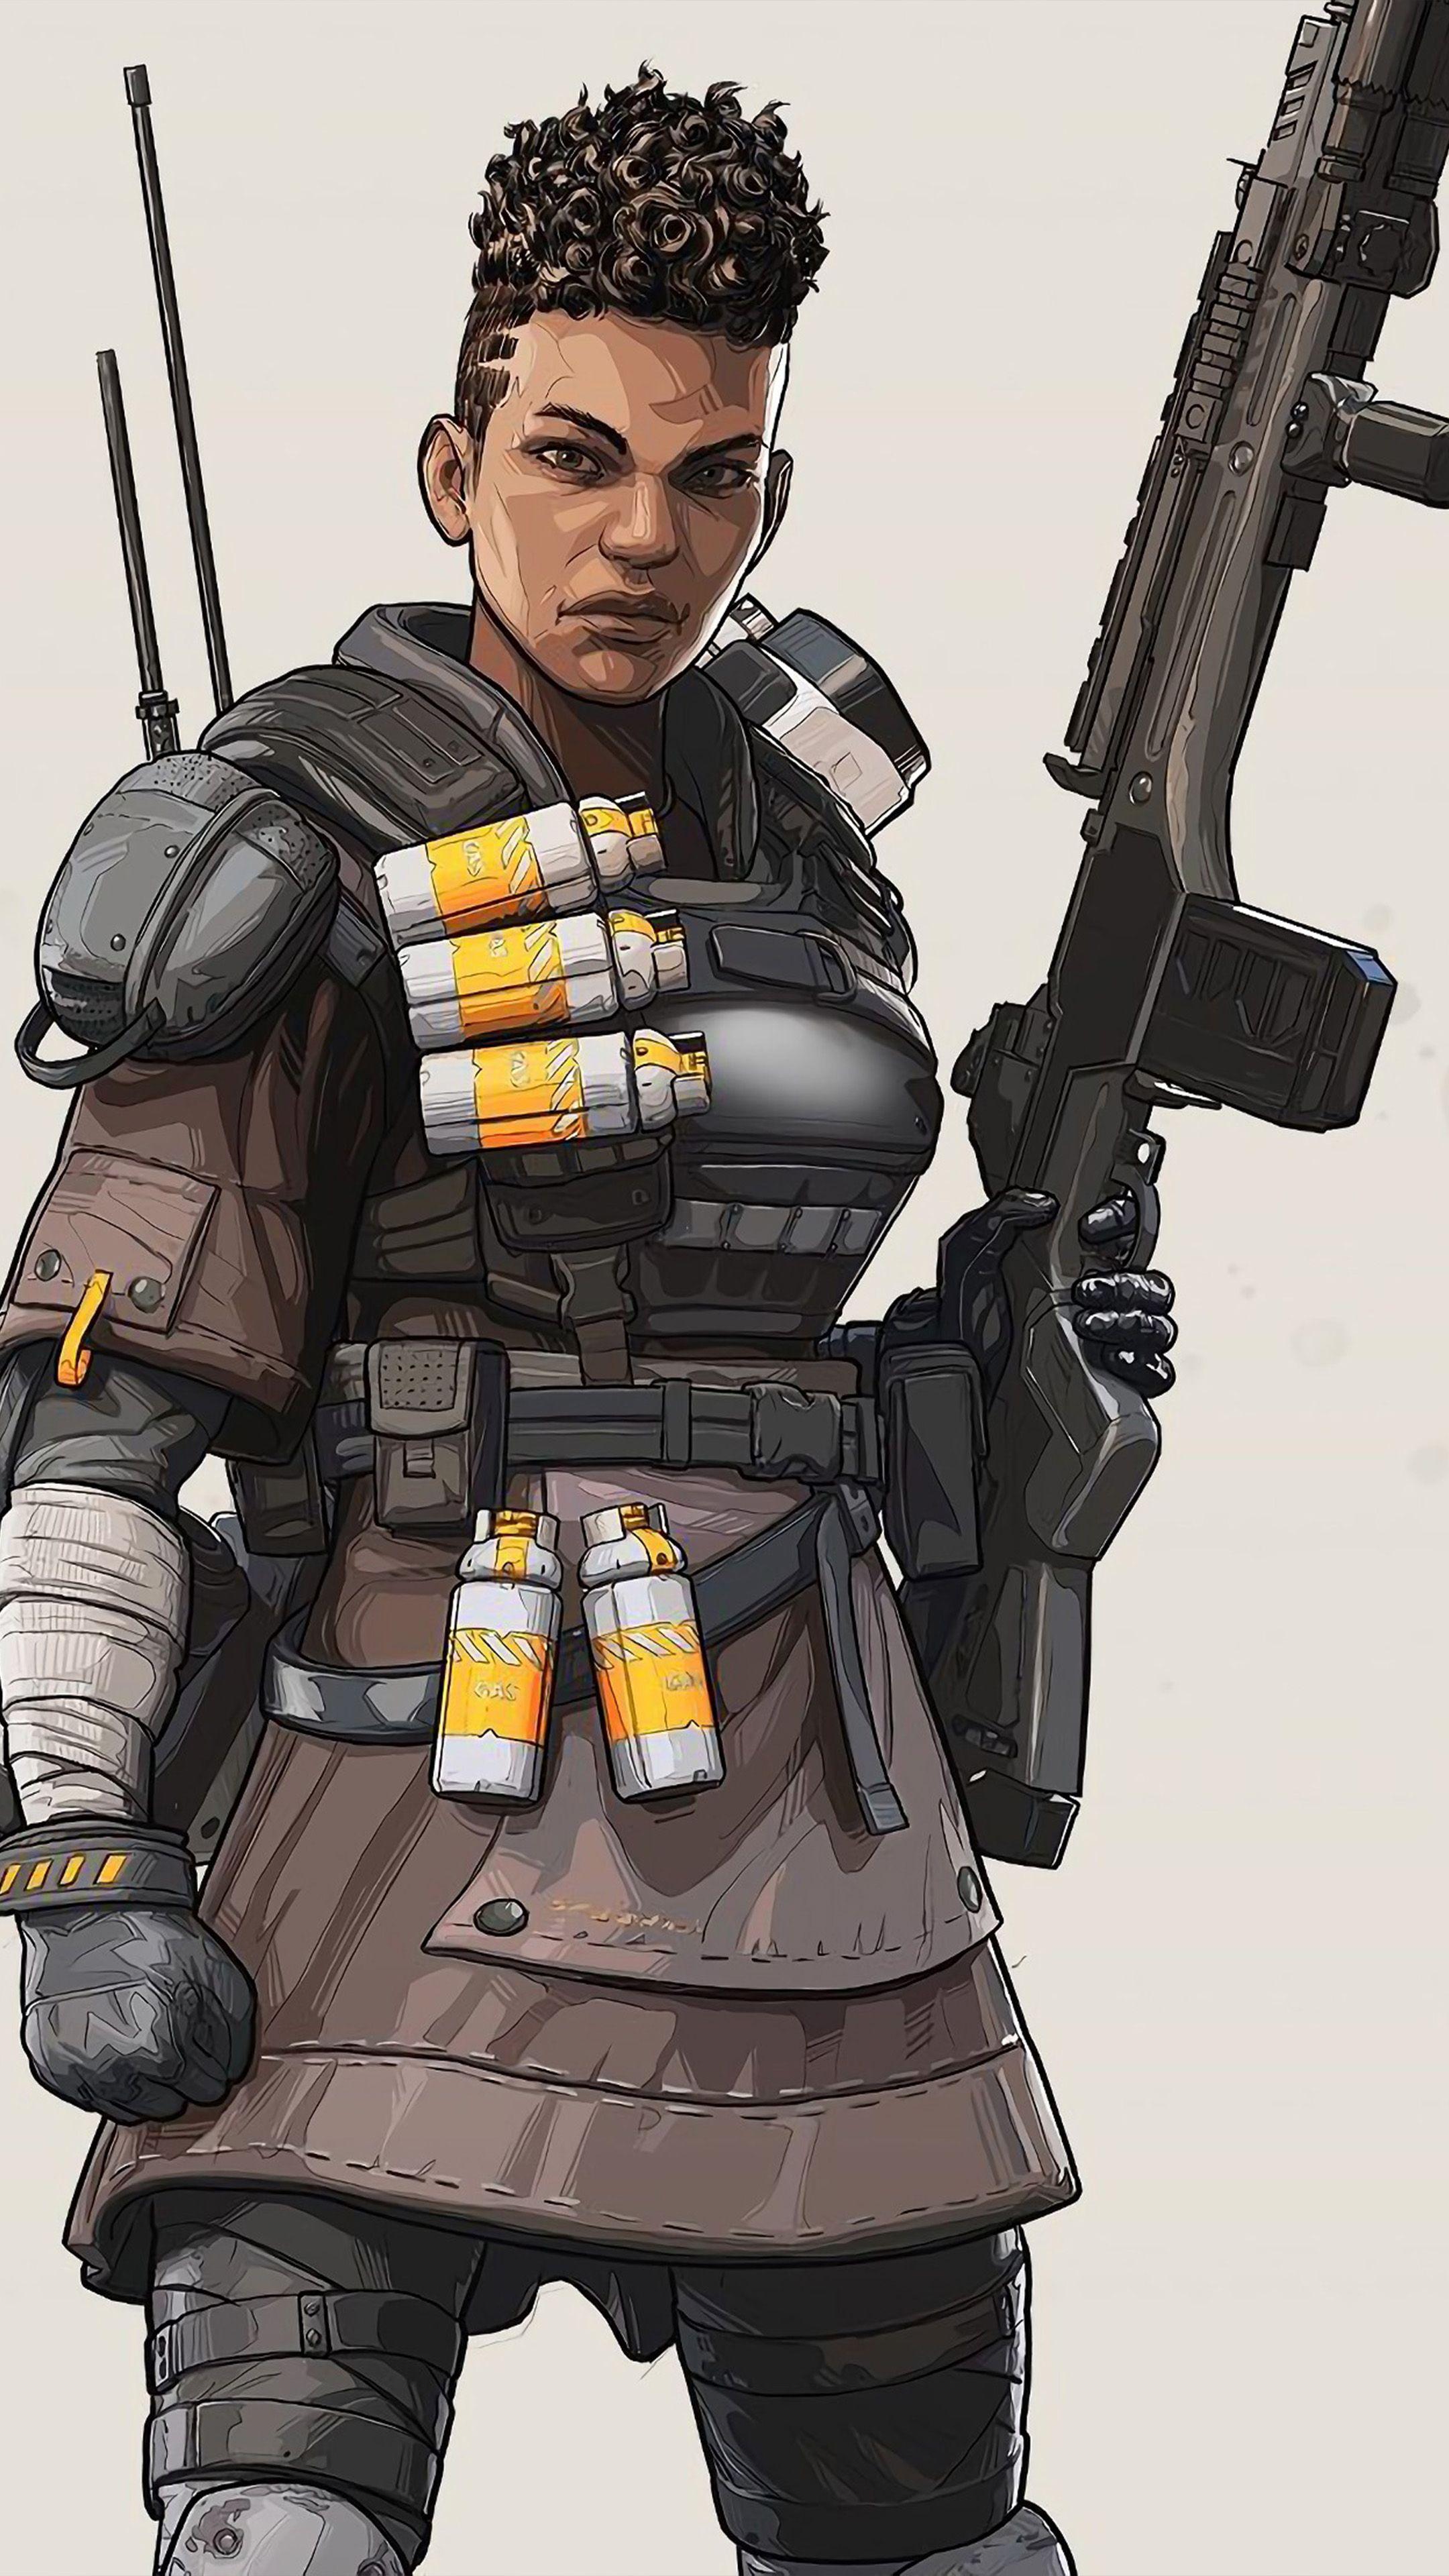 Bangalore Apex Legends Character wallpaper, Female armor